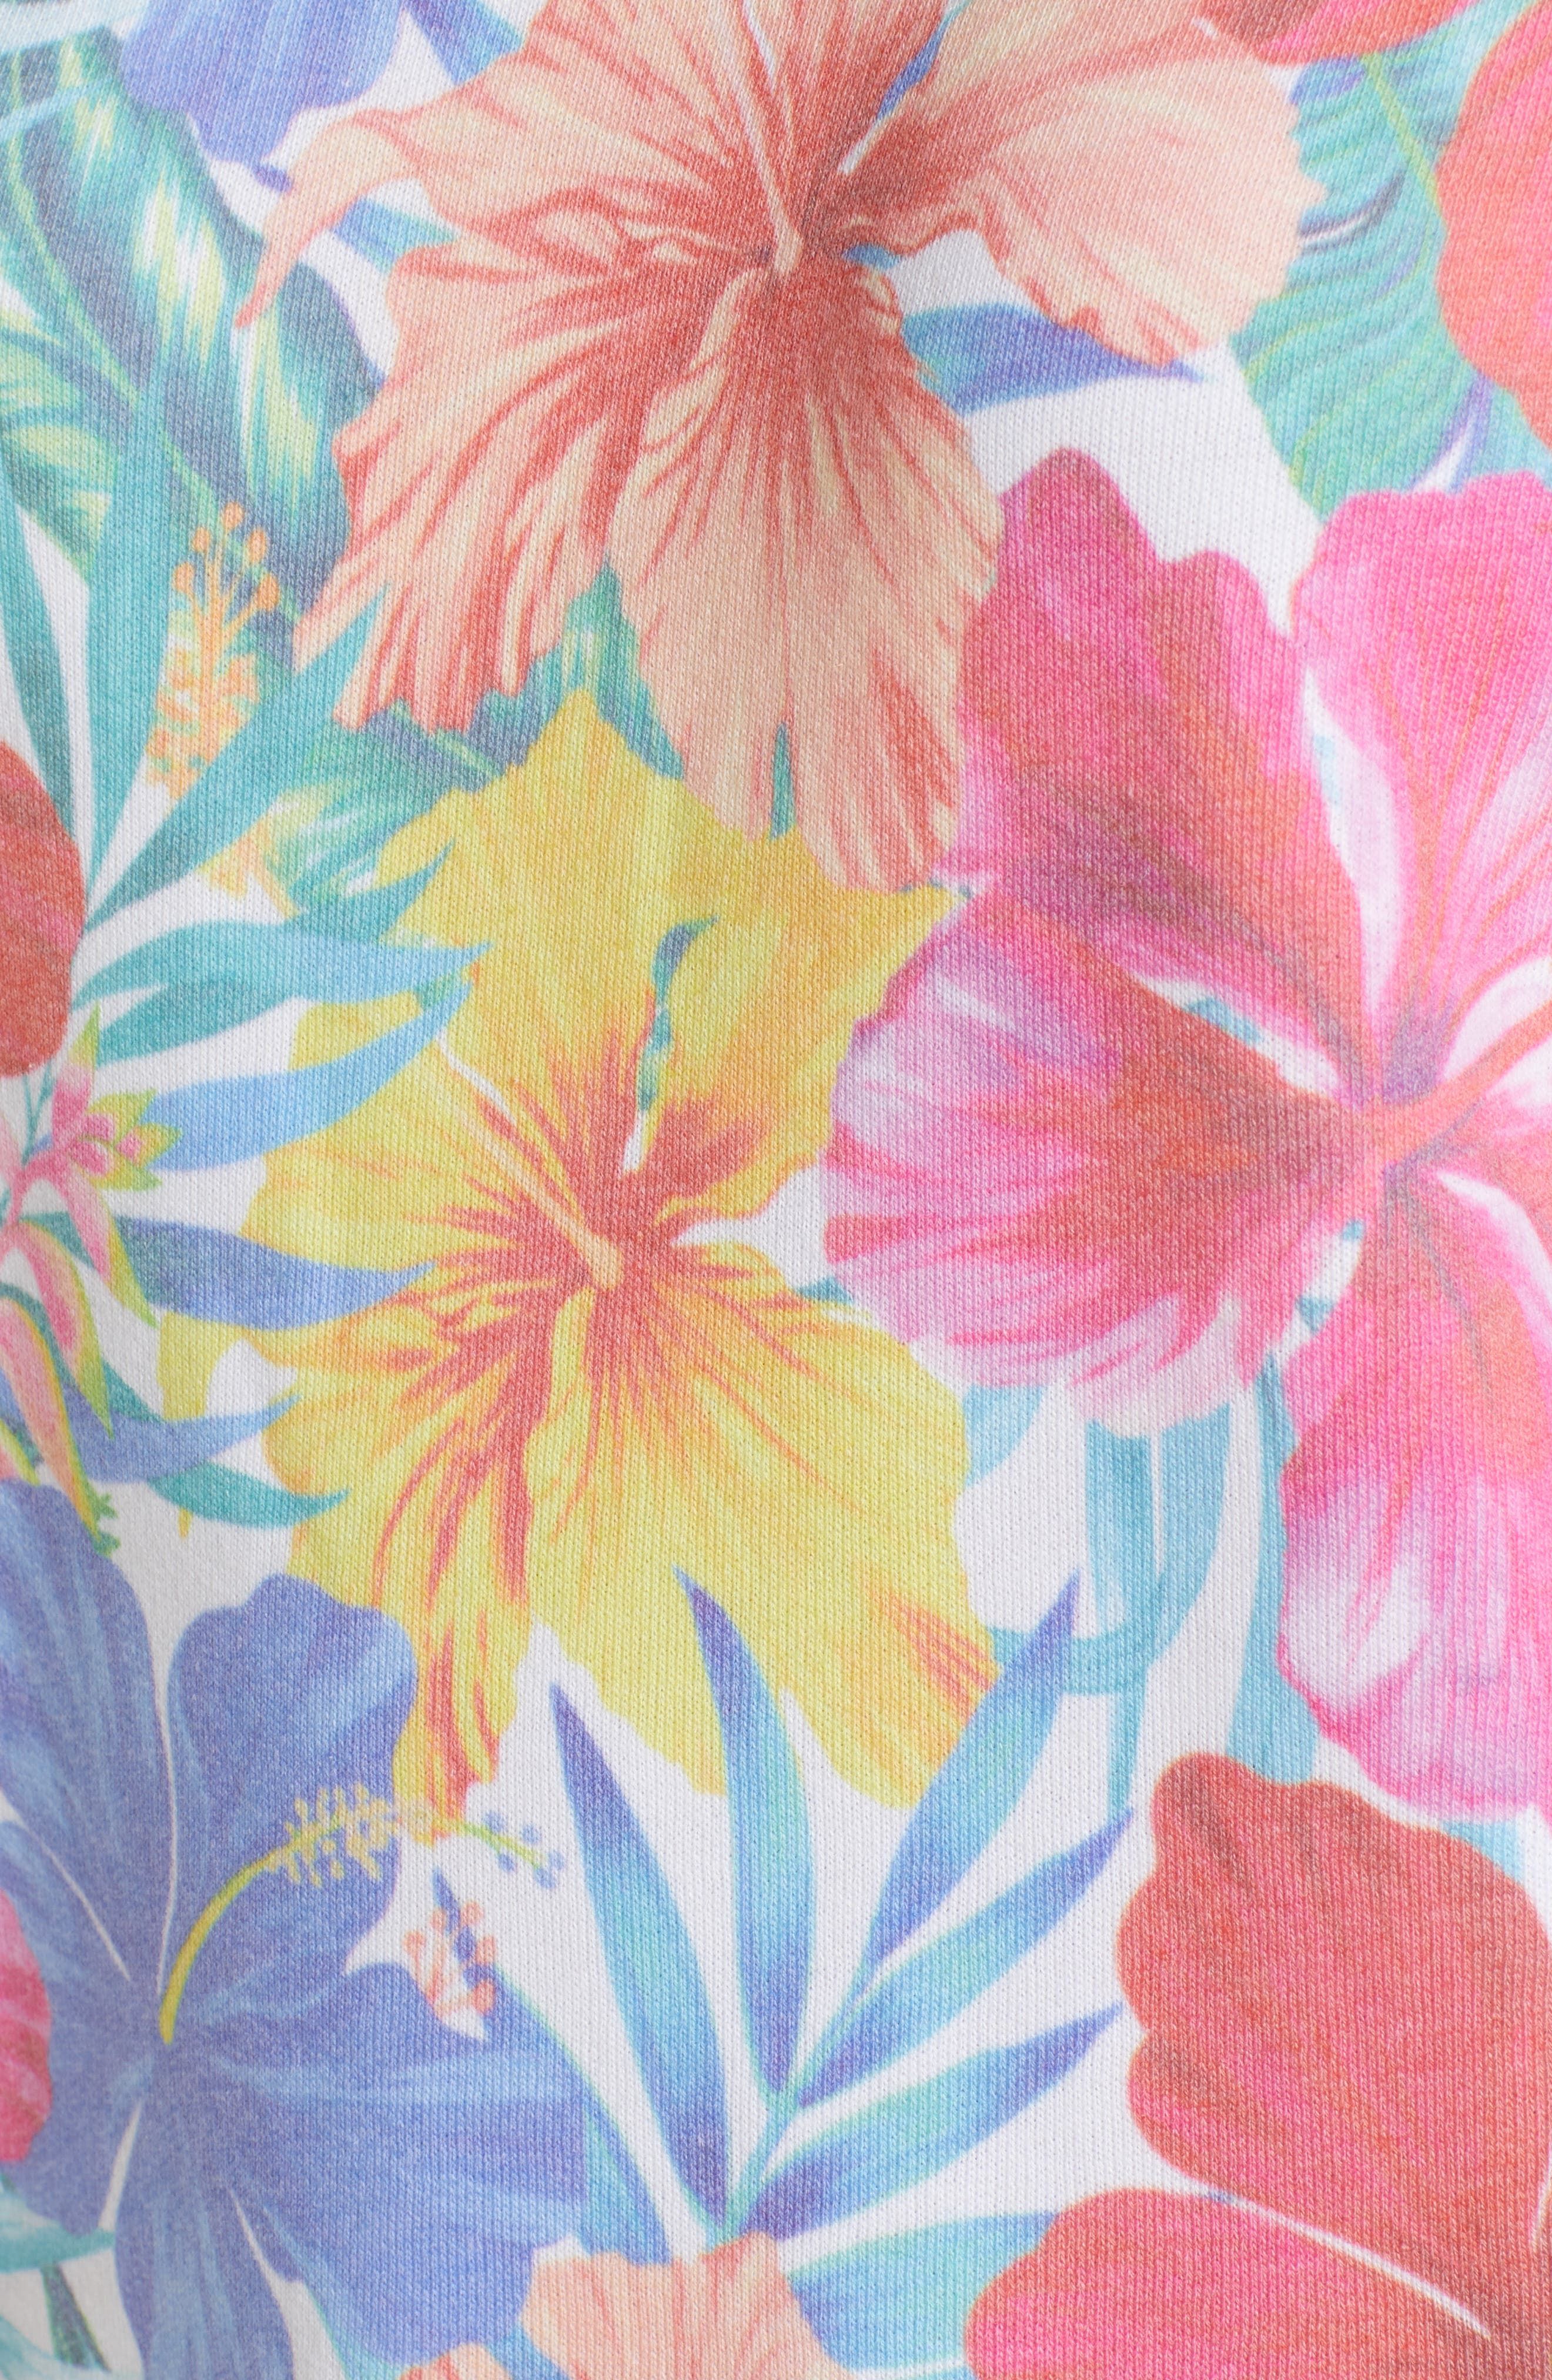 Tropicalia Sommers Sweatshirt,                             Alternate thumbnail 5, color,                             Multi Colored